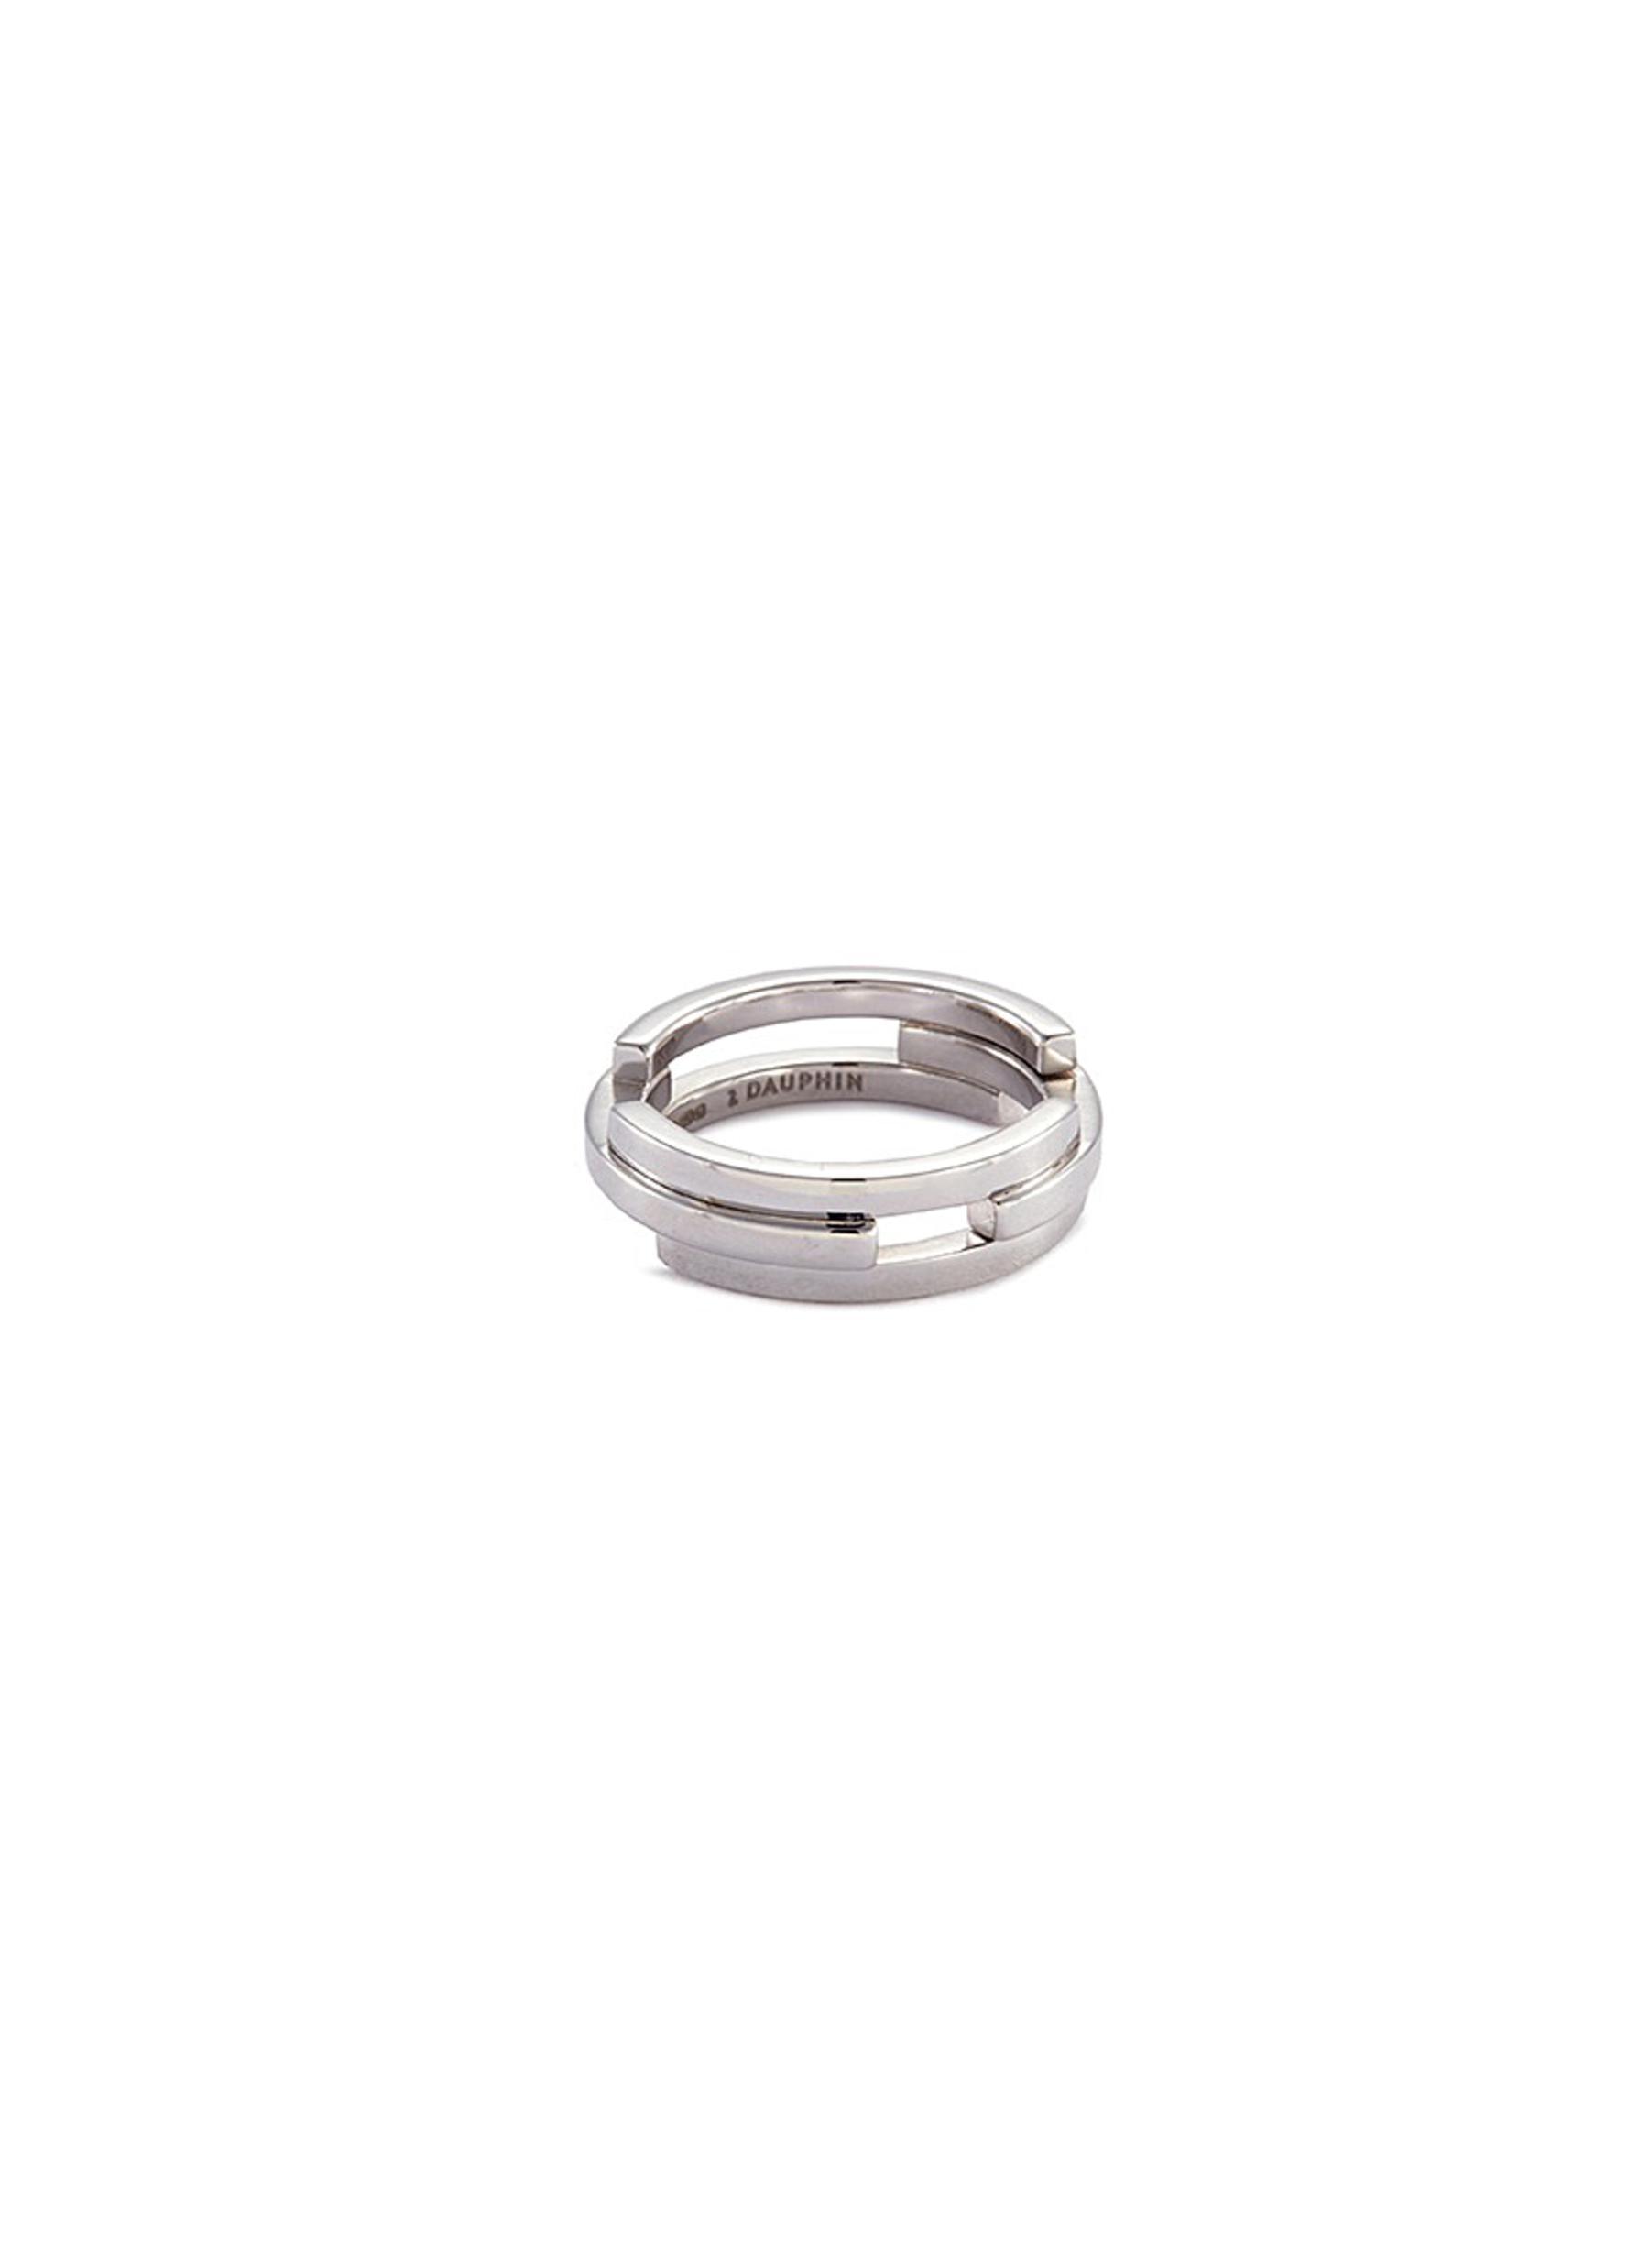 'Volume' 18k white gold three tier ring